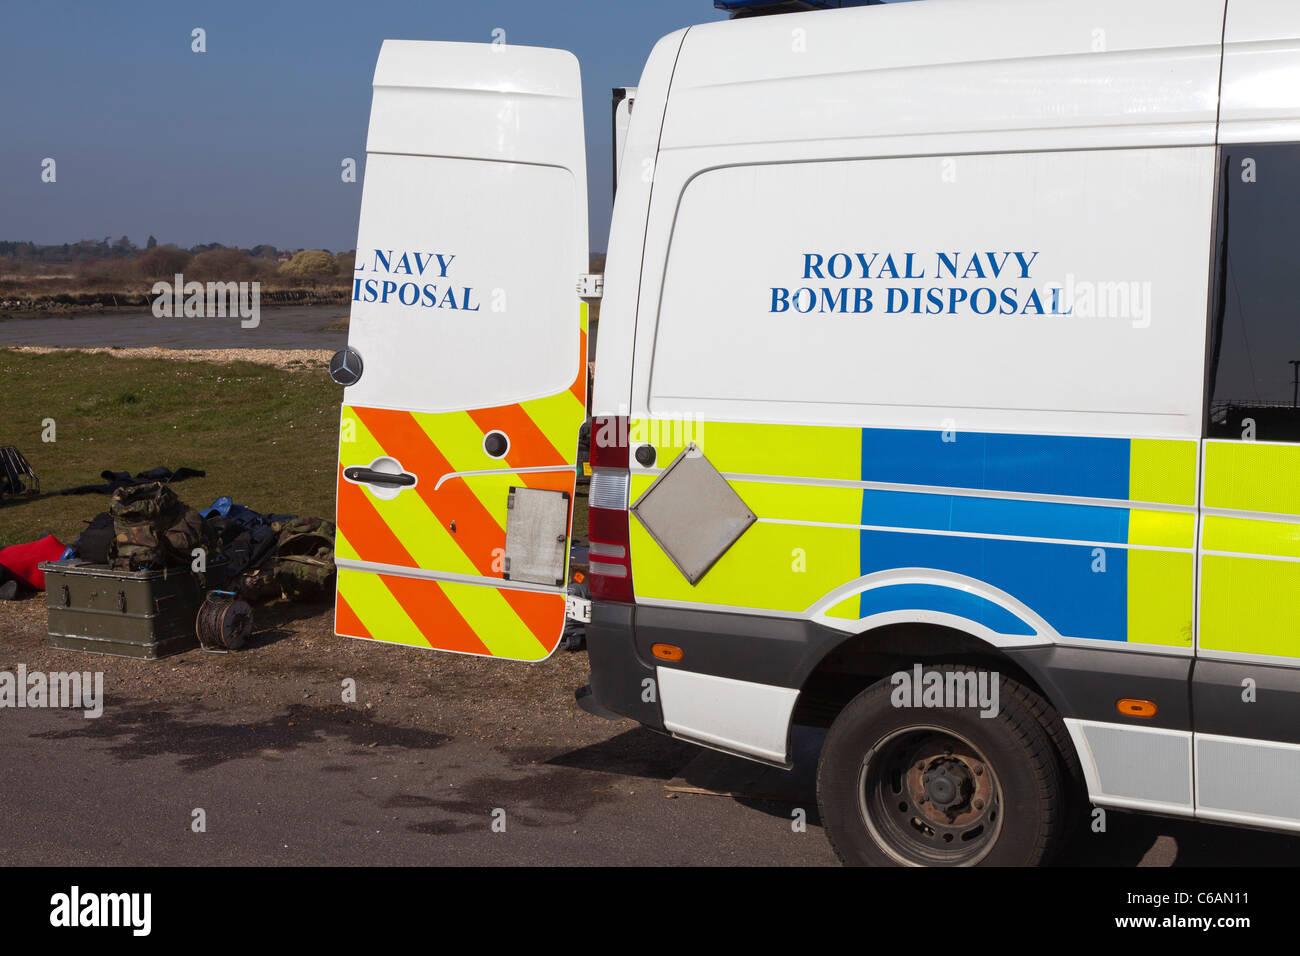 Royal Navy Bombenentschärfung Fahrzeug van Notfallmaßnahmen diffuse sichern sicher sprengen Berufsarmee Stockbild